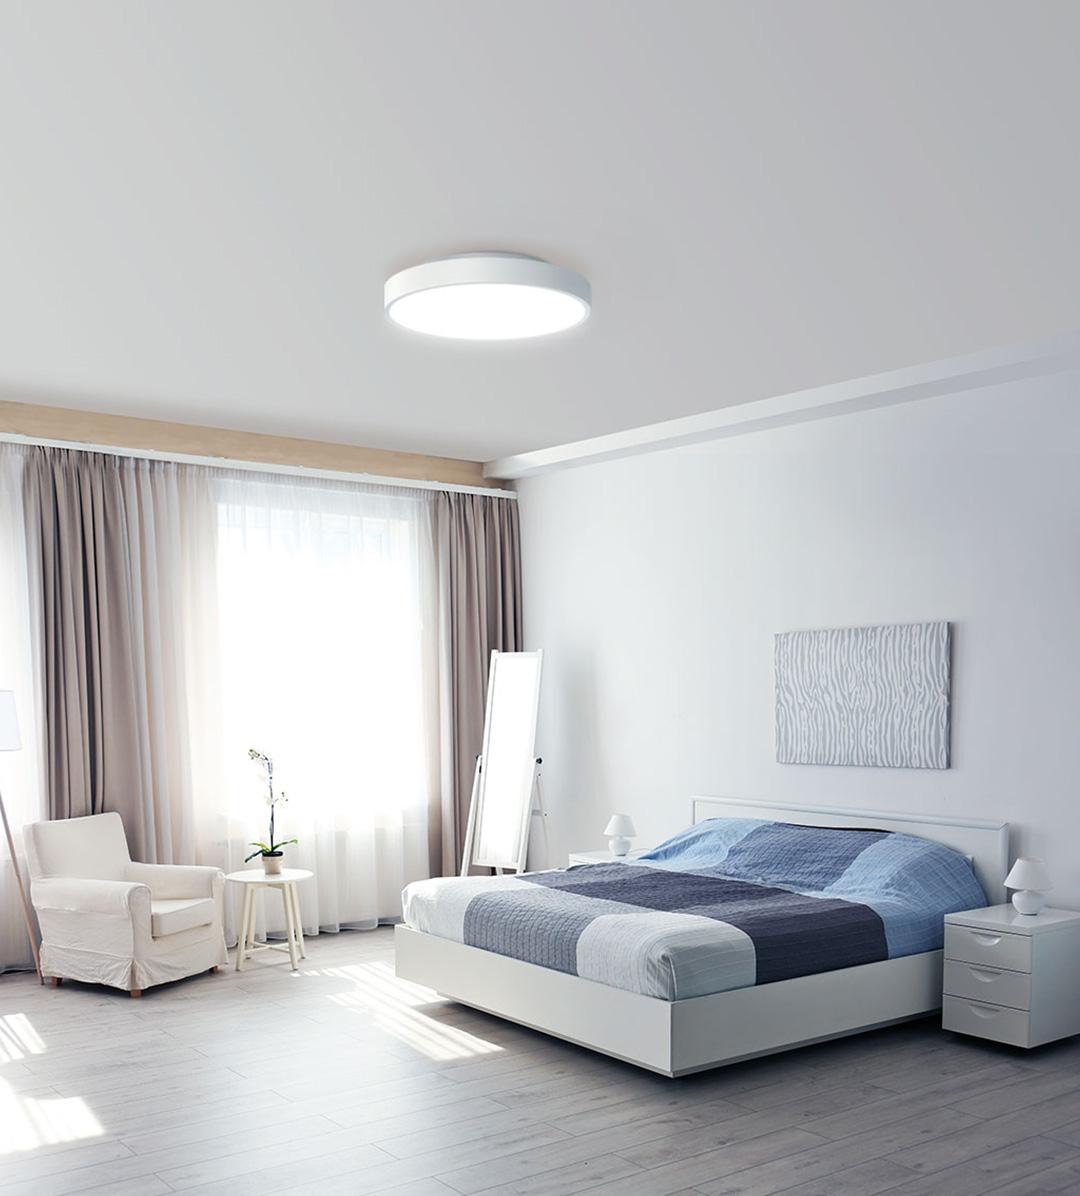 Xiaomi Yeelight Smart LED Ceiling Light 320 Enhanced Version